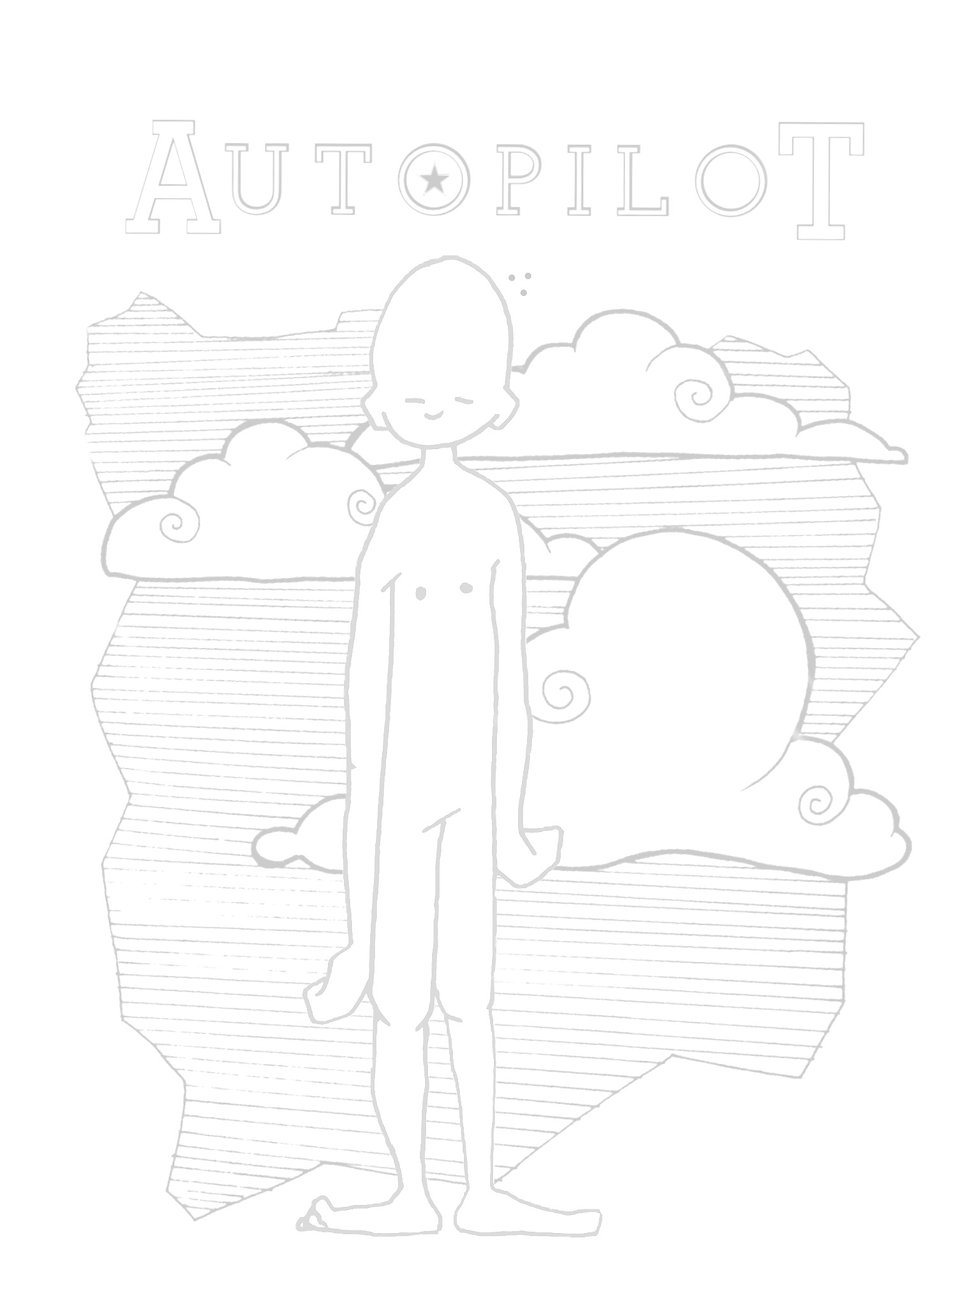 AutoPilot_edited.jpg